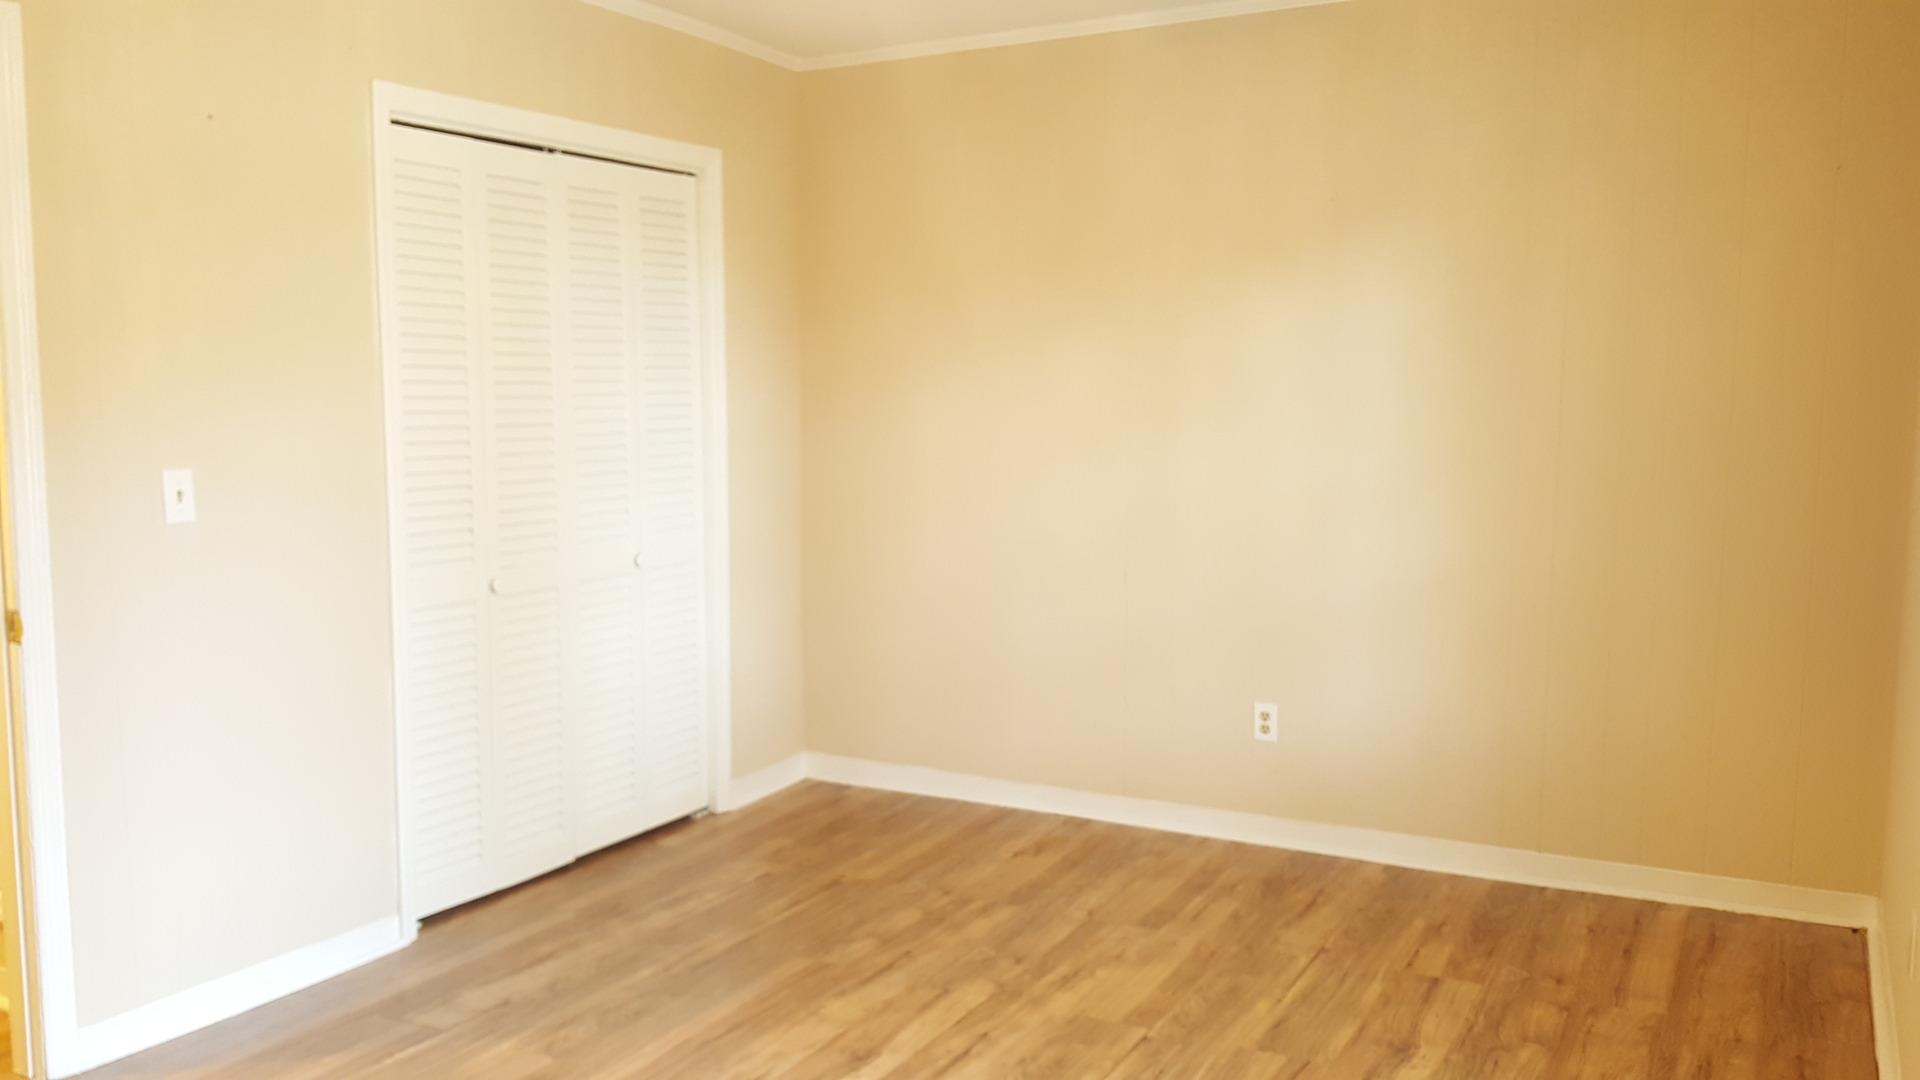 2 Bedroom Townhome W/ Wood Floors Golf Capital